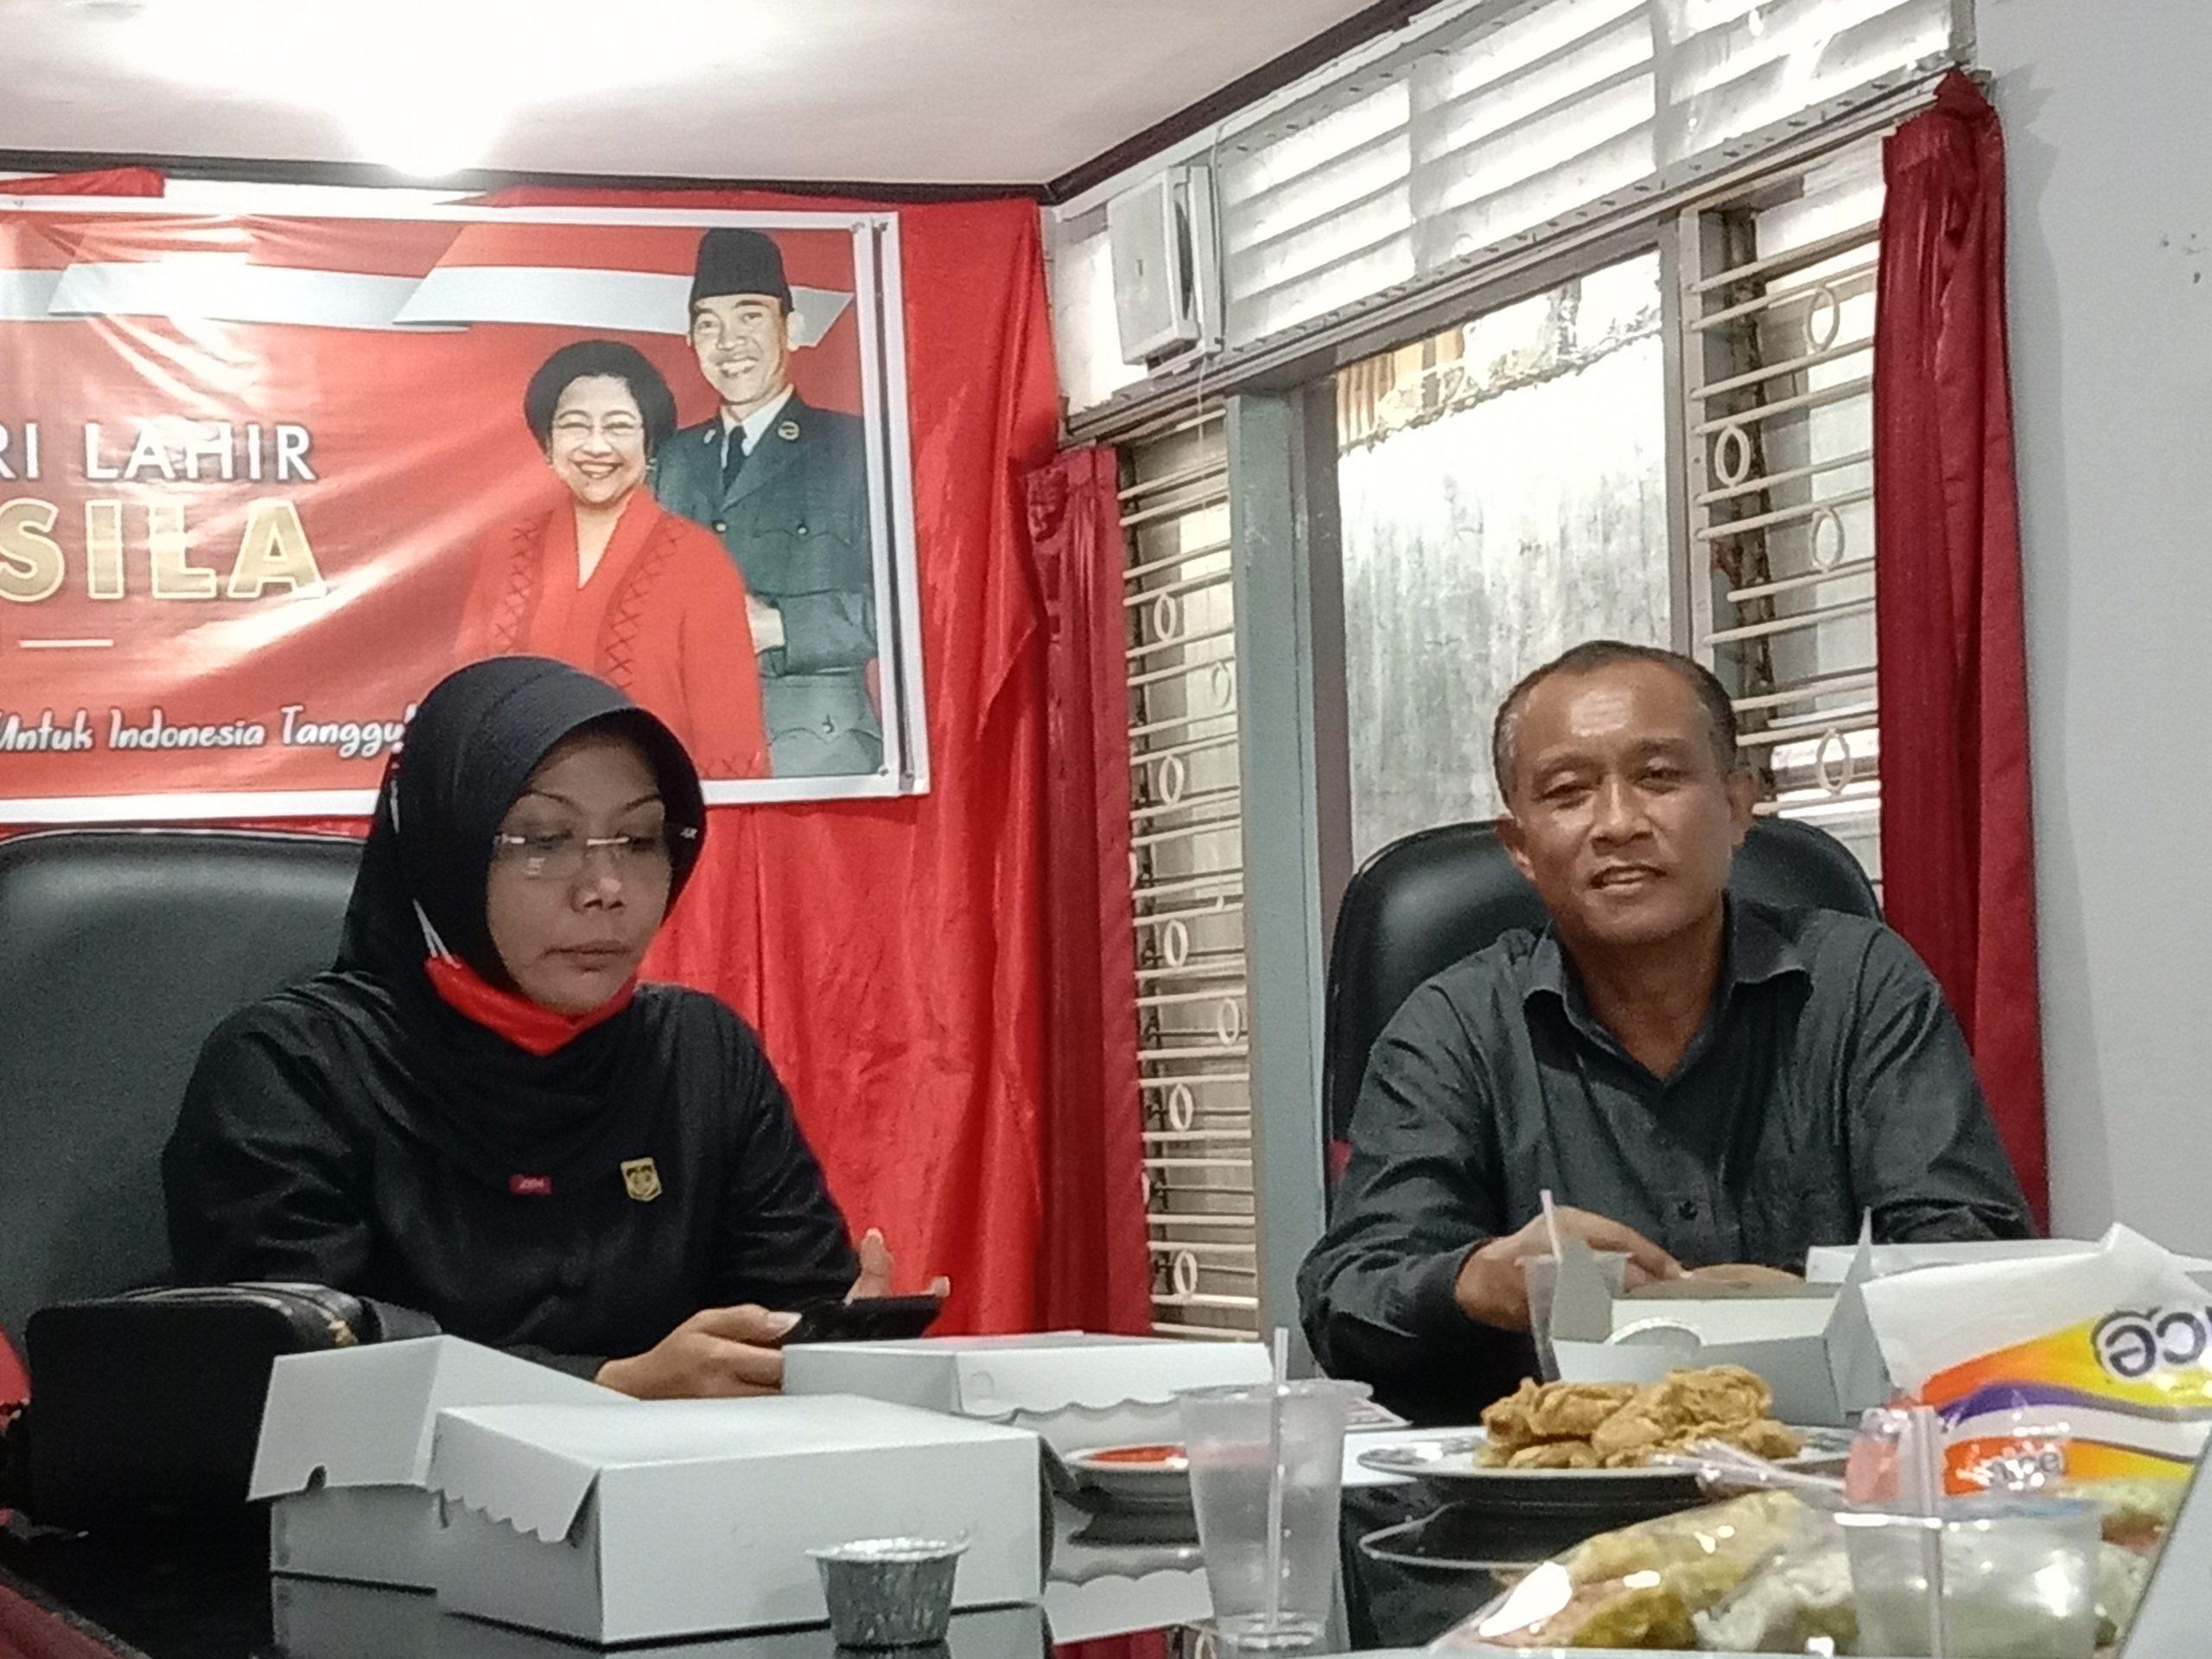 KETUA DPC PDIP Kota Mataram, Made Slamet; bersama Sekretaris DPC Nyayu Ernawati saat memberi keterangan kepada media, Senin (14/6/2021). Foto: rul